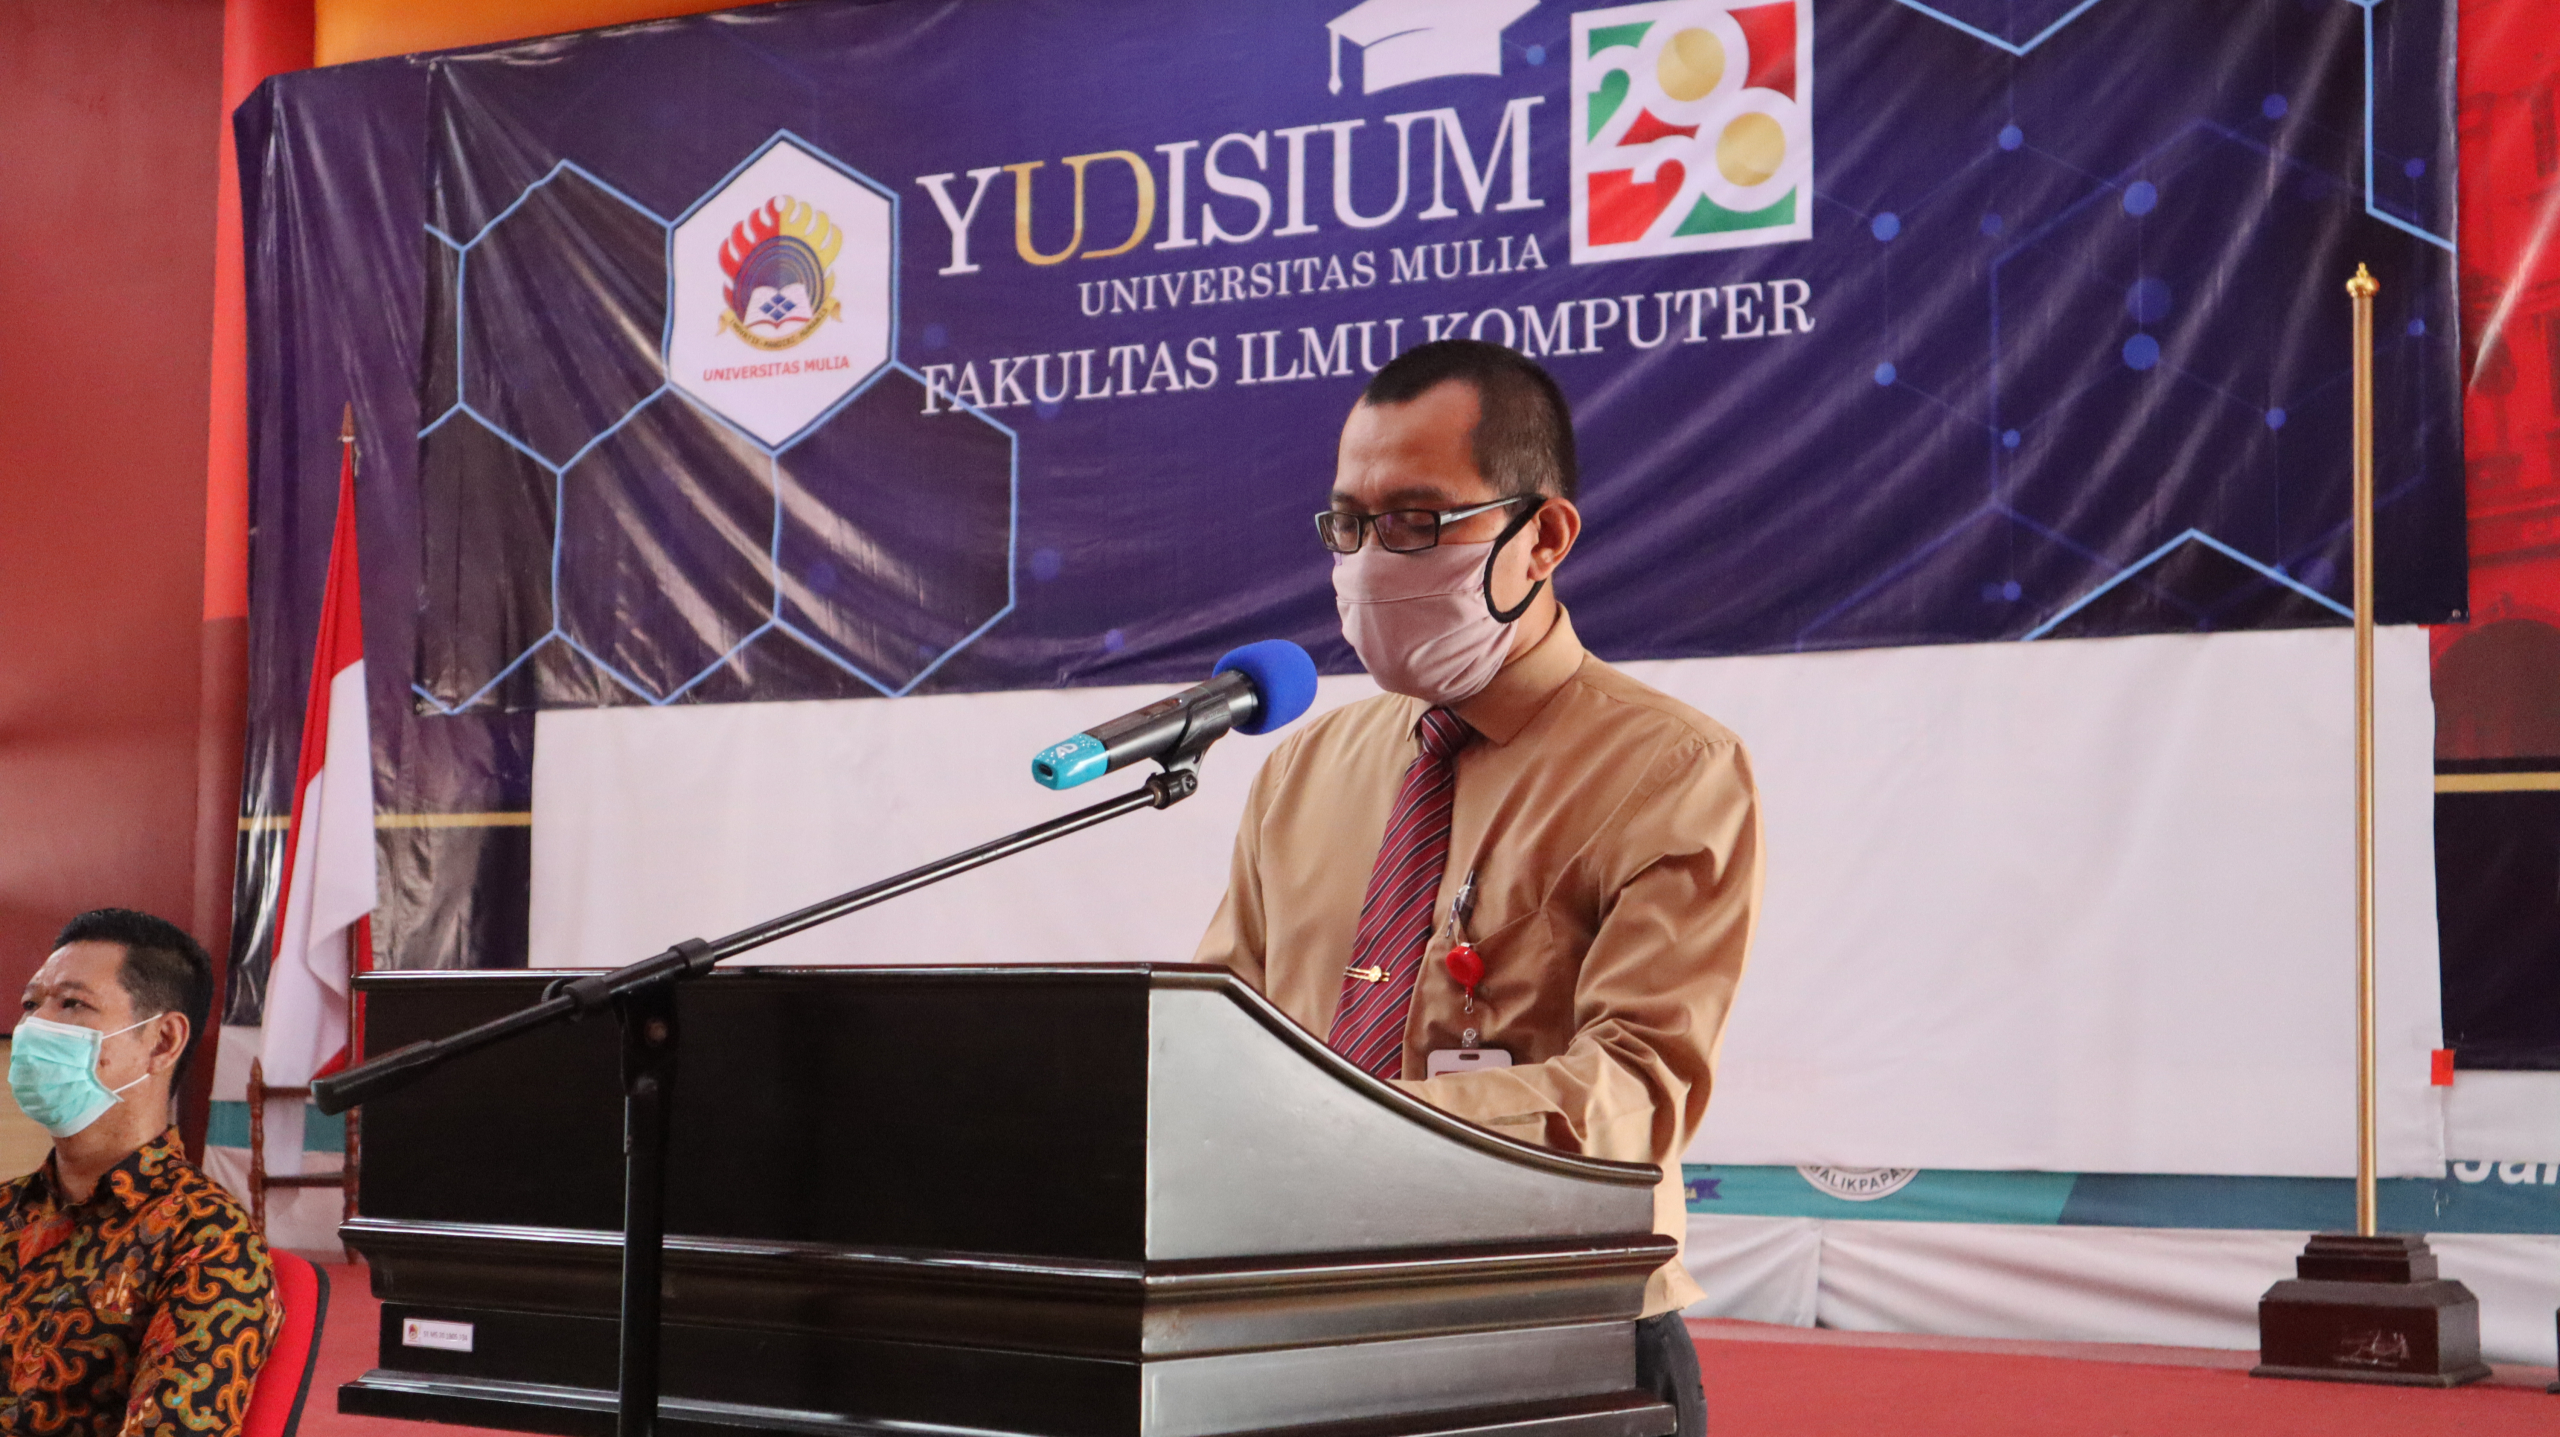 Dekan Fakultas Ilmu Komputer Bapak Wisnu Hera Pamungkas, S.T.P., M.Eng. memberikan sambutan Yudisium